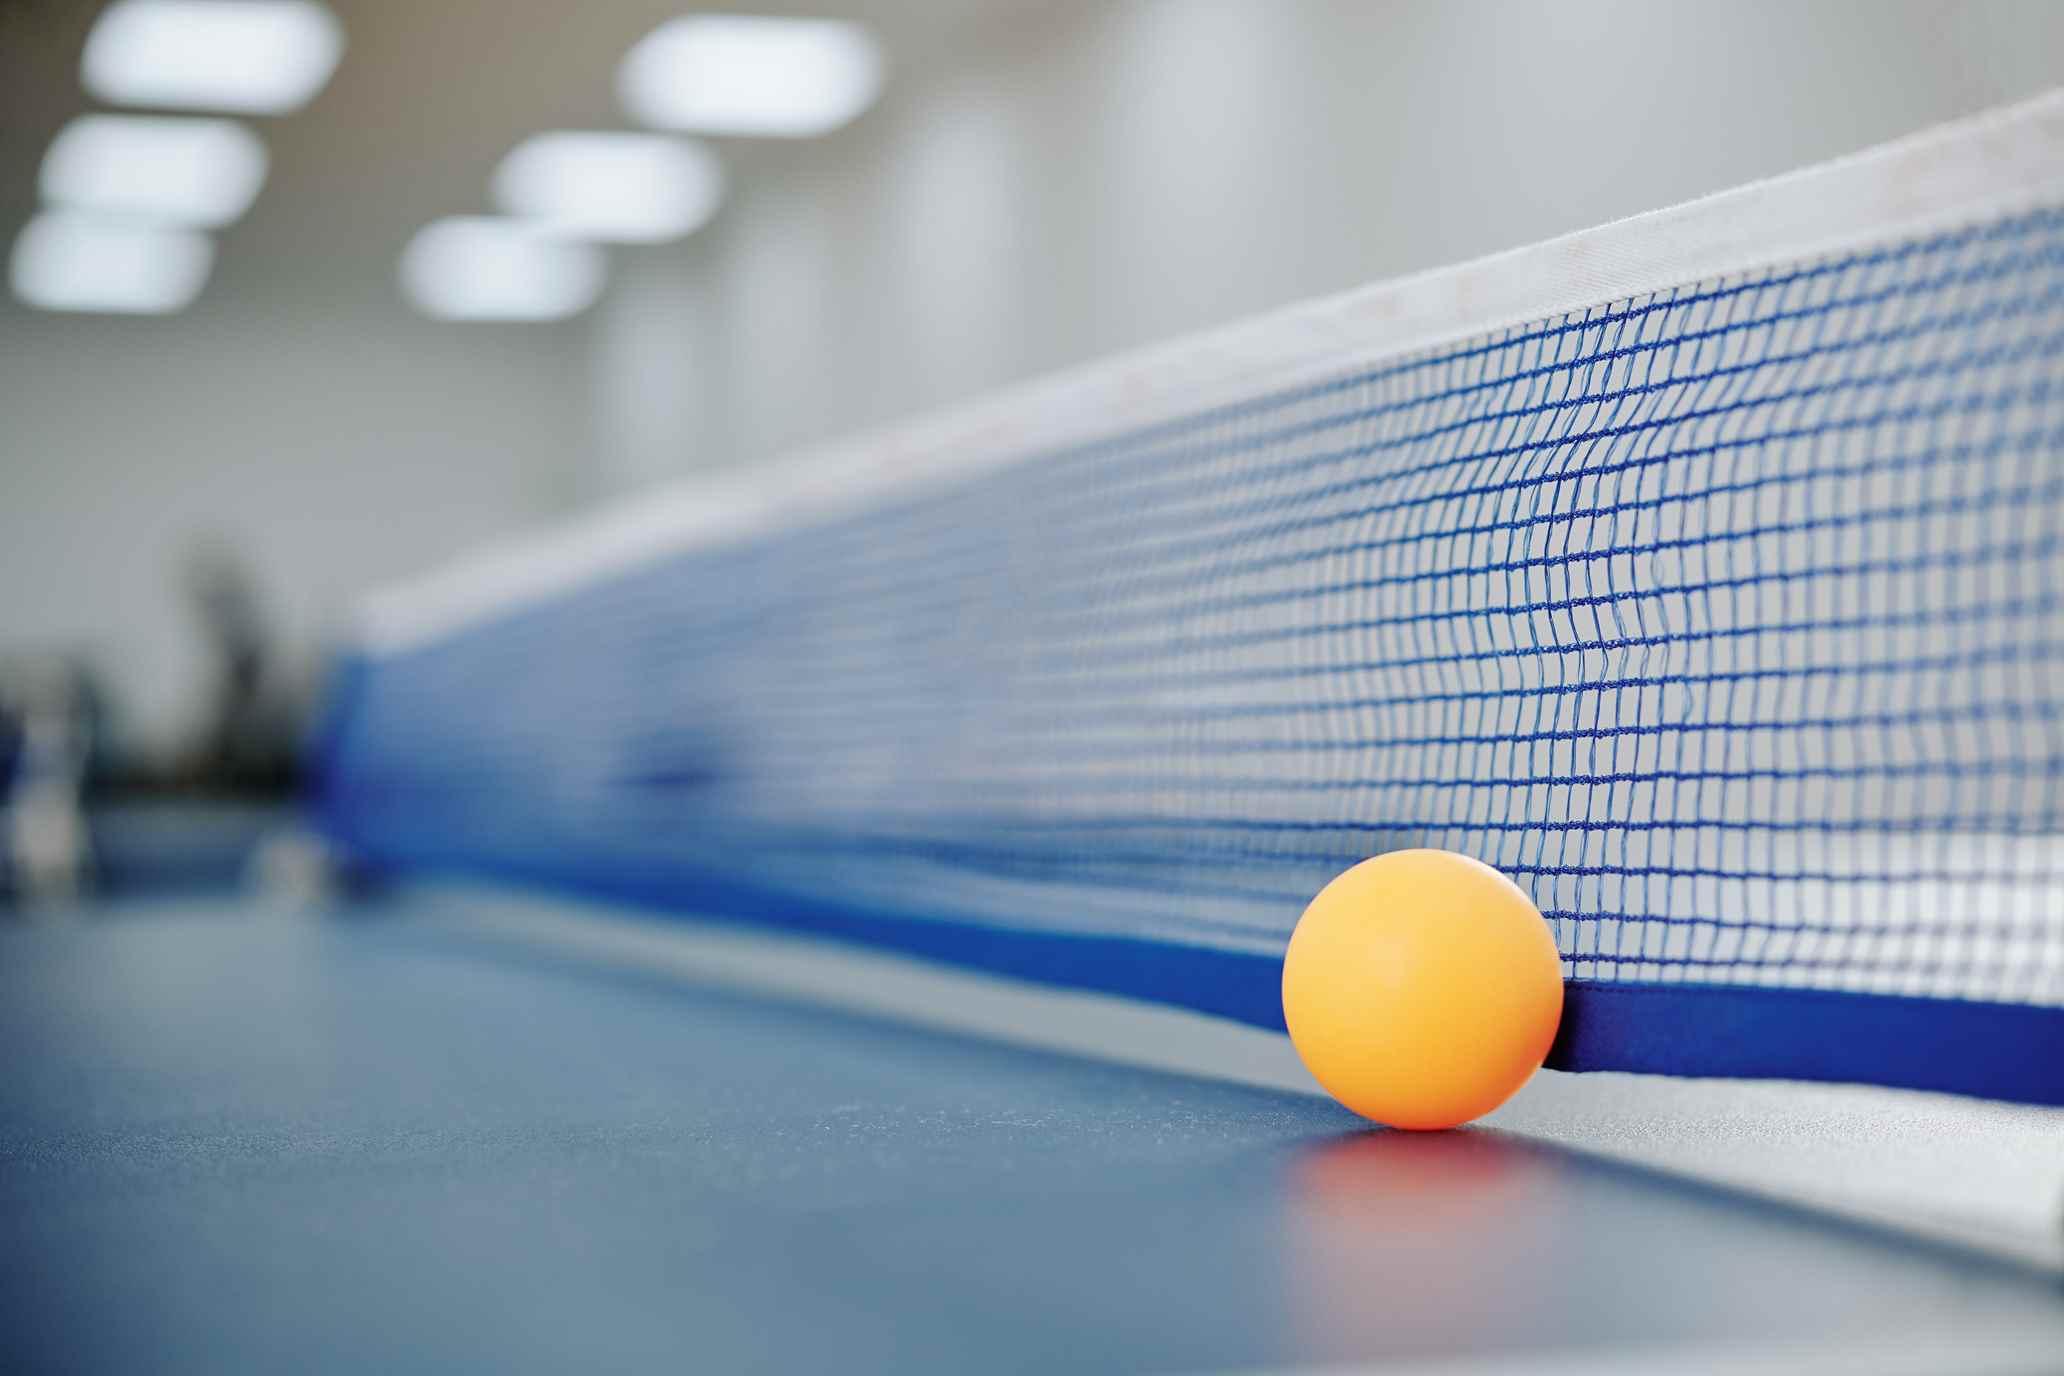 Best Table Tennis Ball: Noob vs Pro (1-Star vs 3-Star Balls)